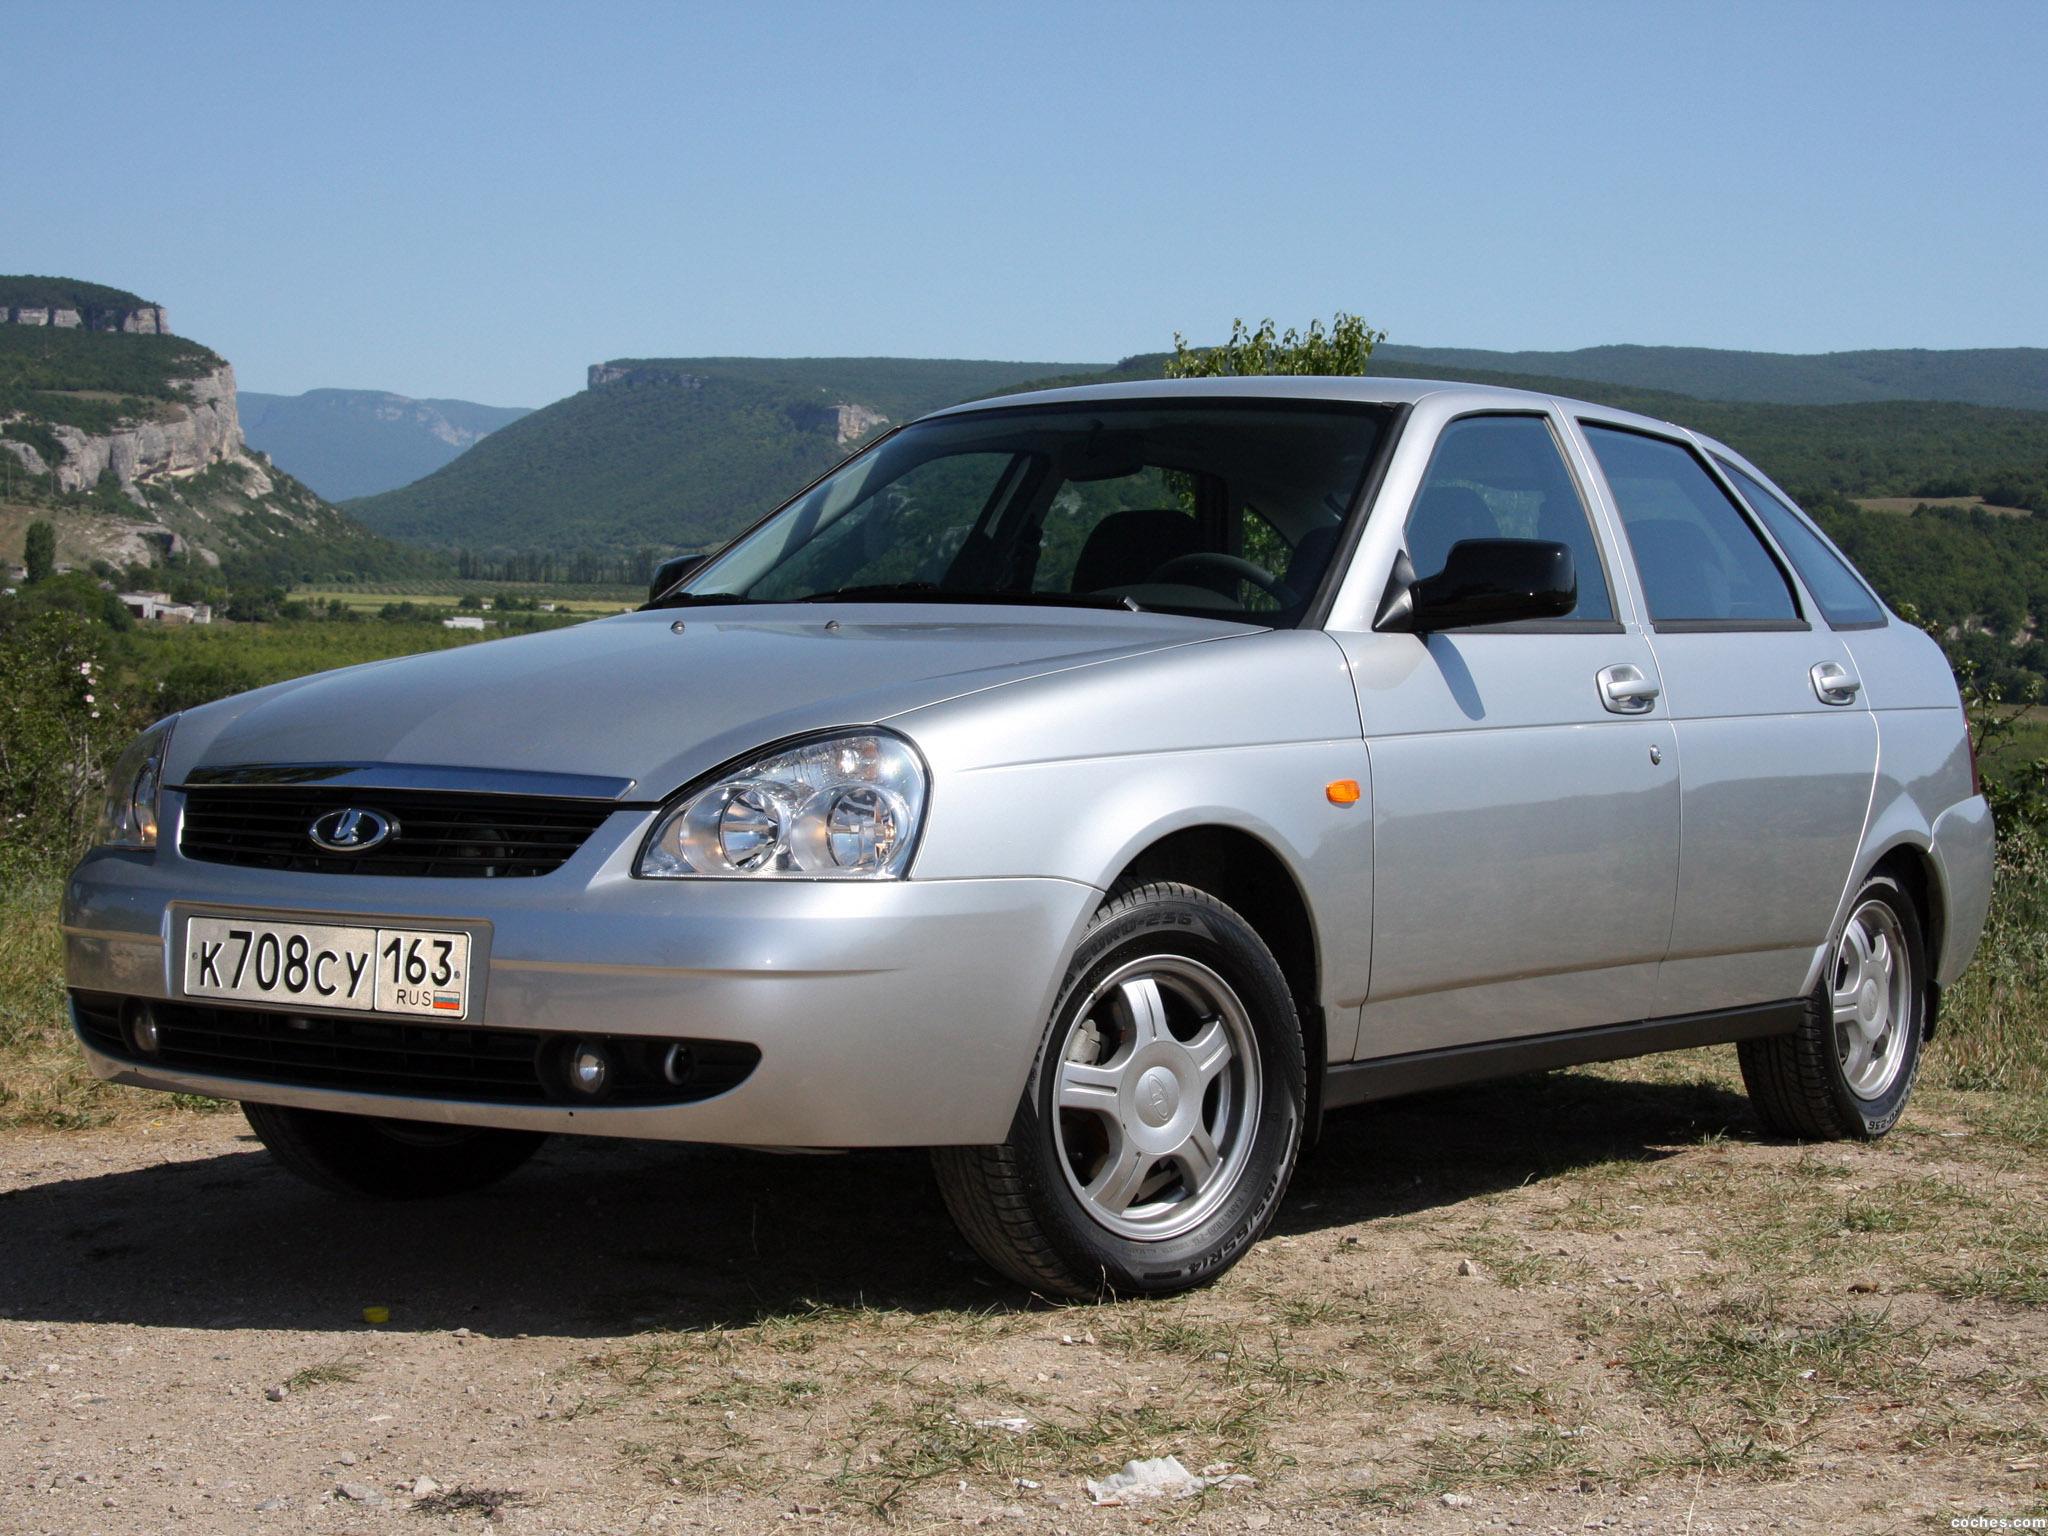 Foto 0 de Lada Priora Hatchback 2008